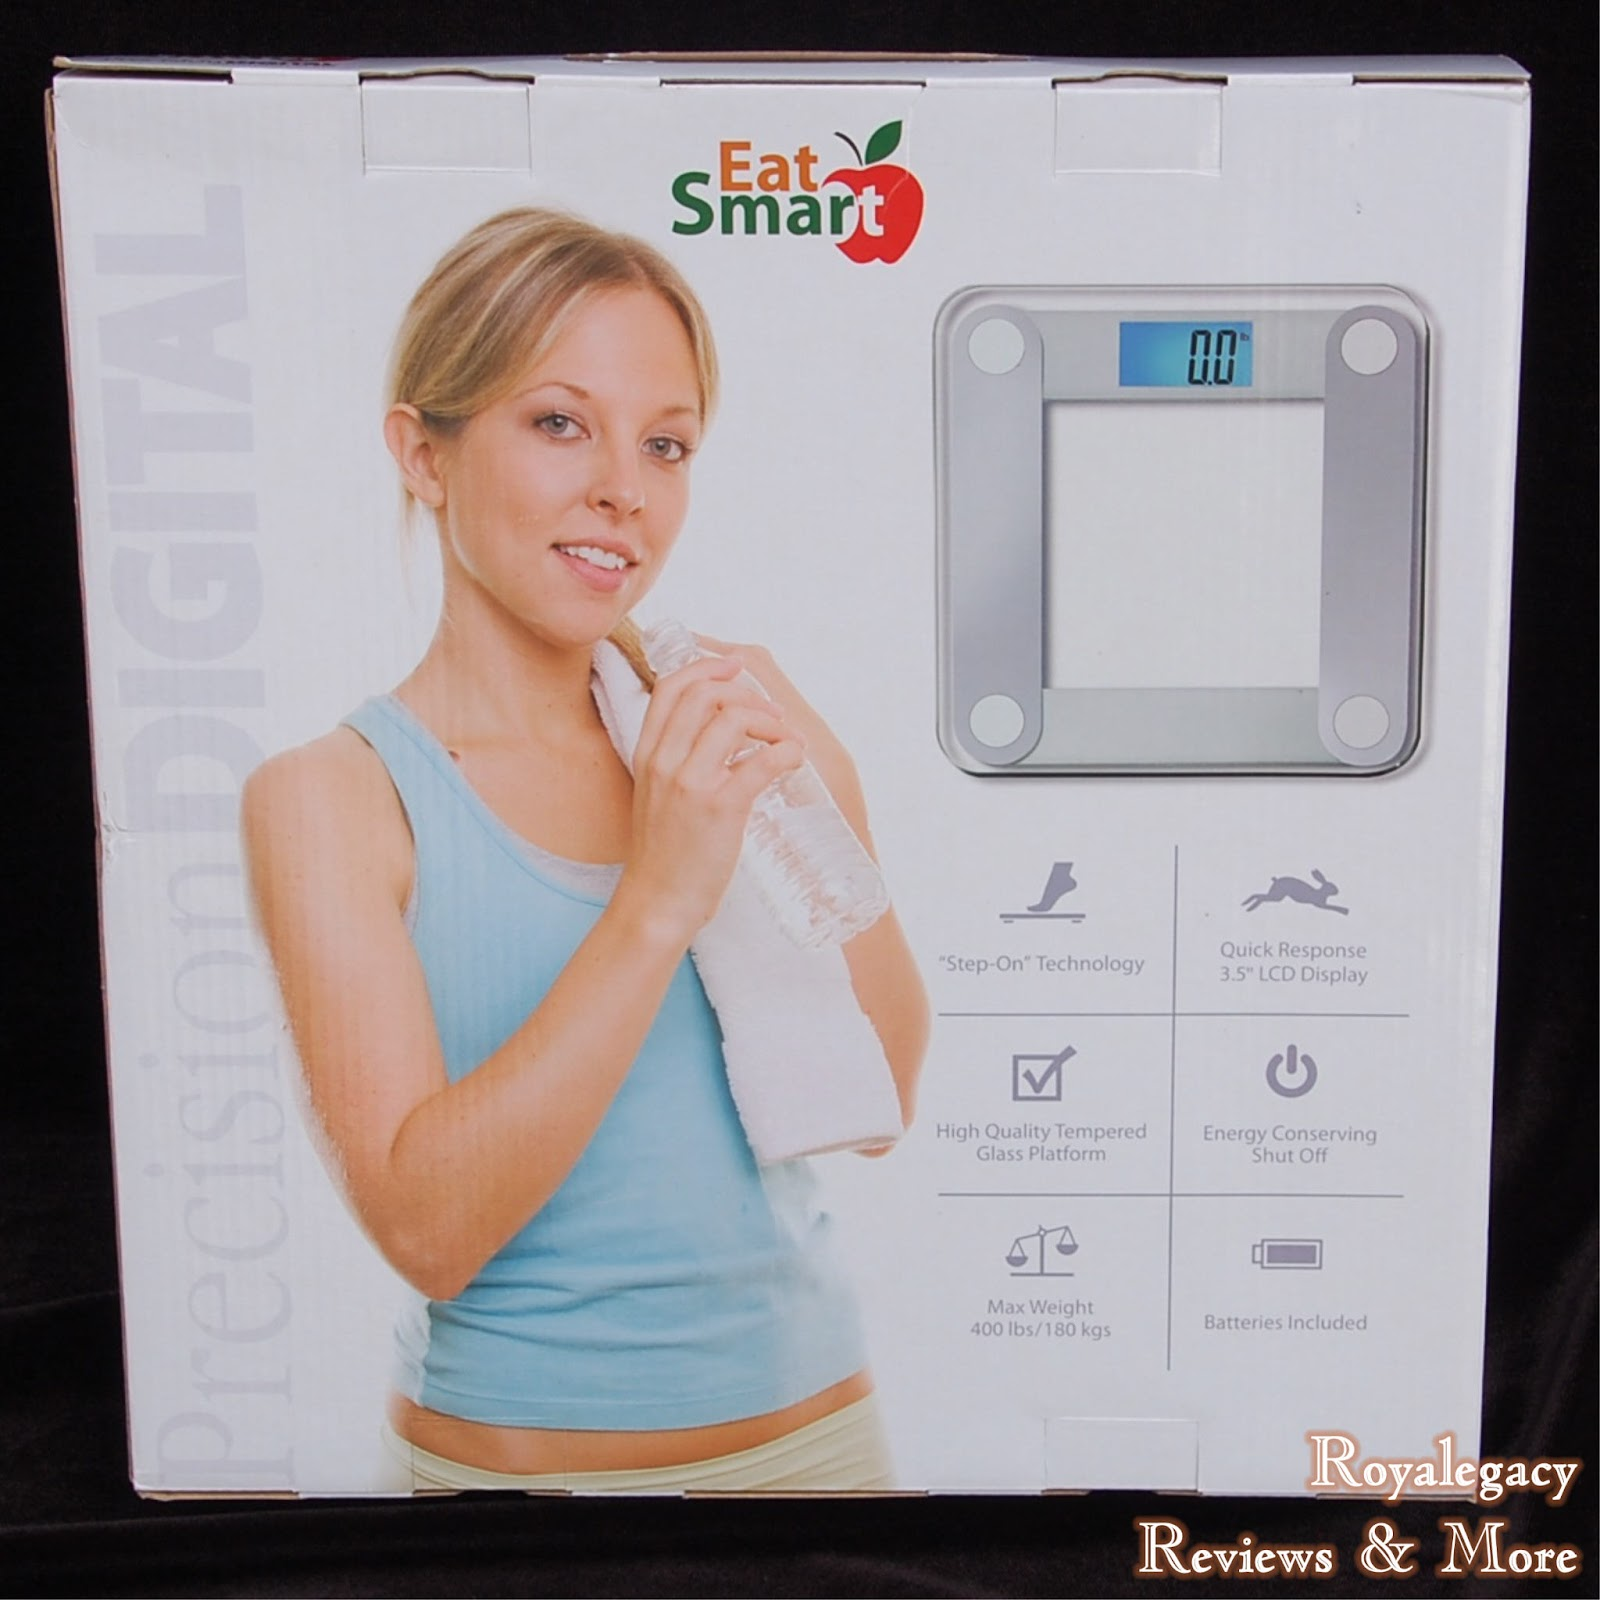 Eatsmart precision digital bathroom scale review - Eatsmart Precision Digital Bathroom Scale Review